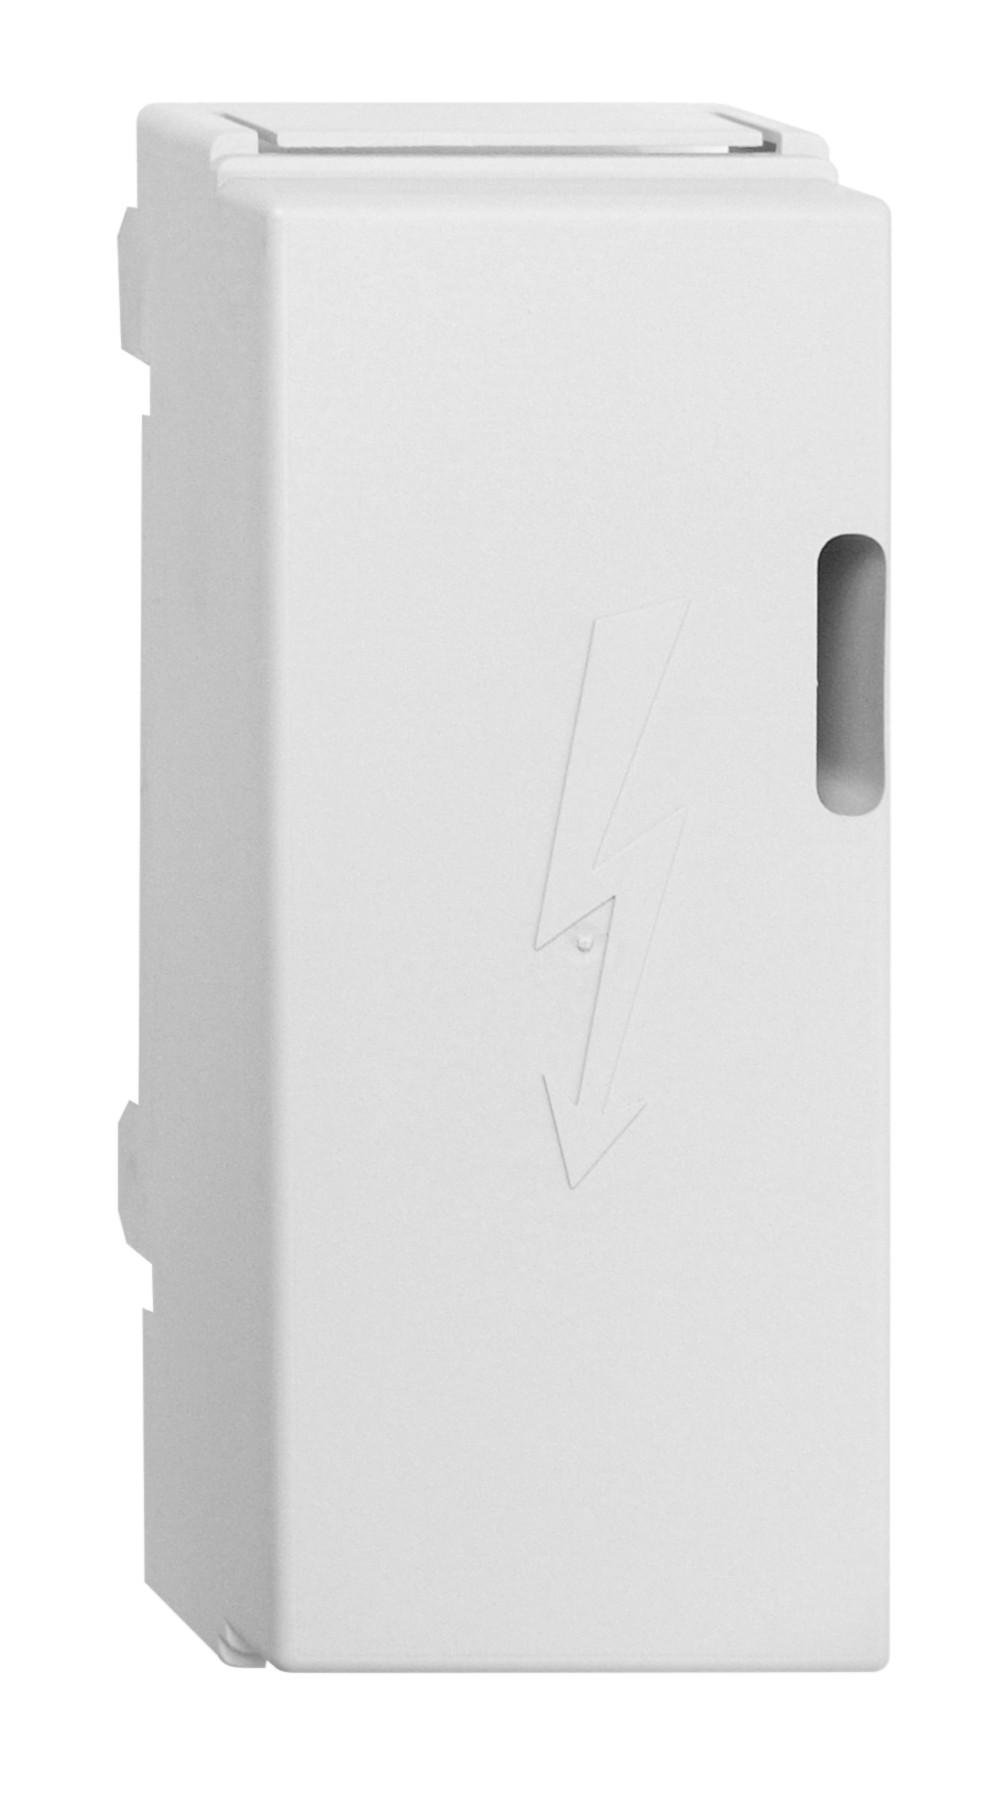 1 Stk Abdeckkappe 84x200mm SI014130--